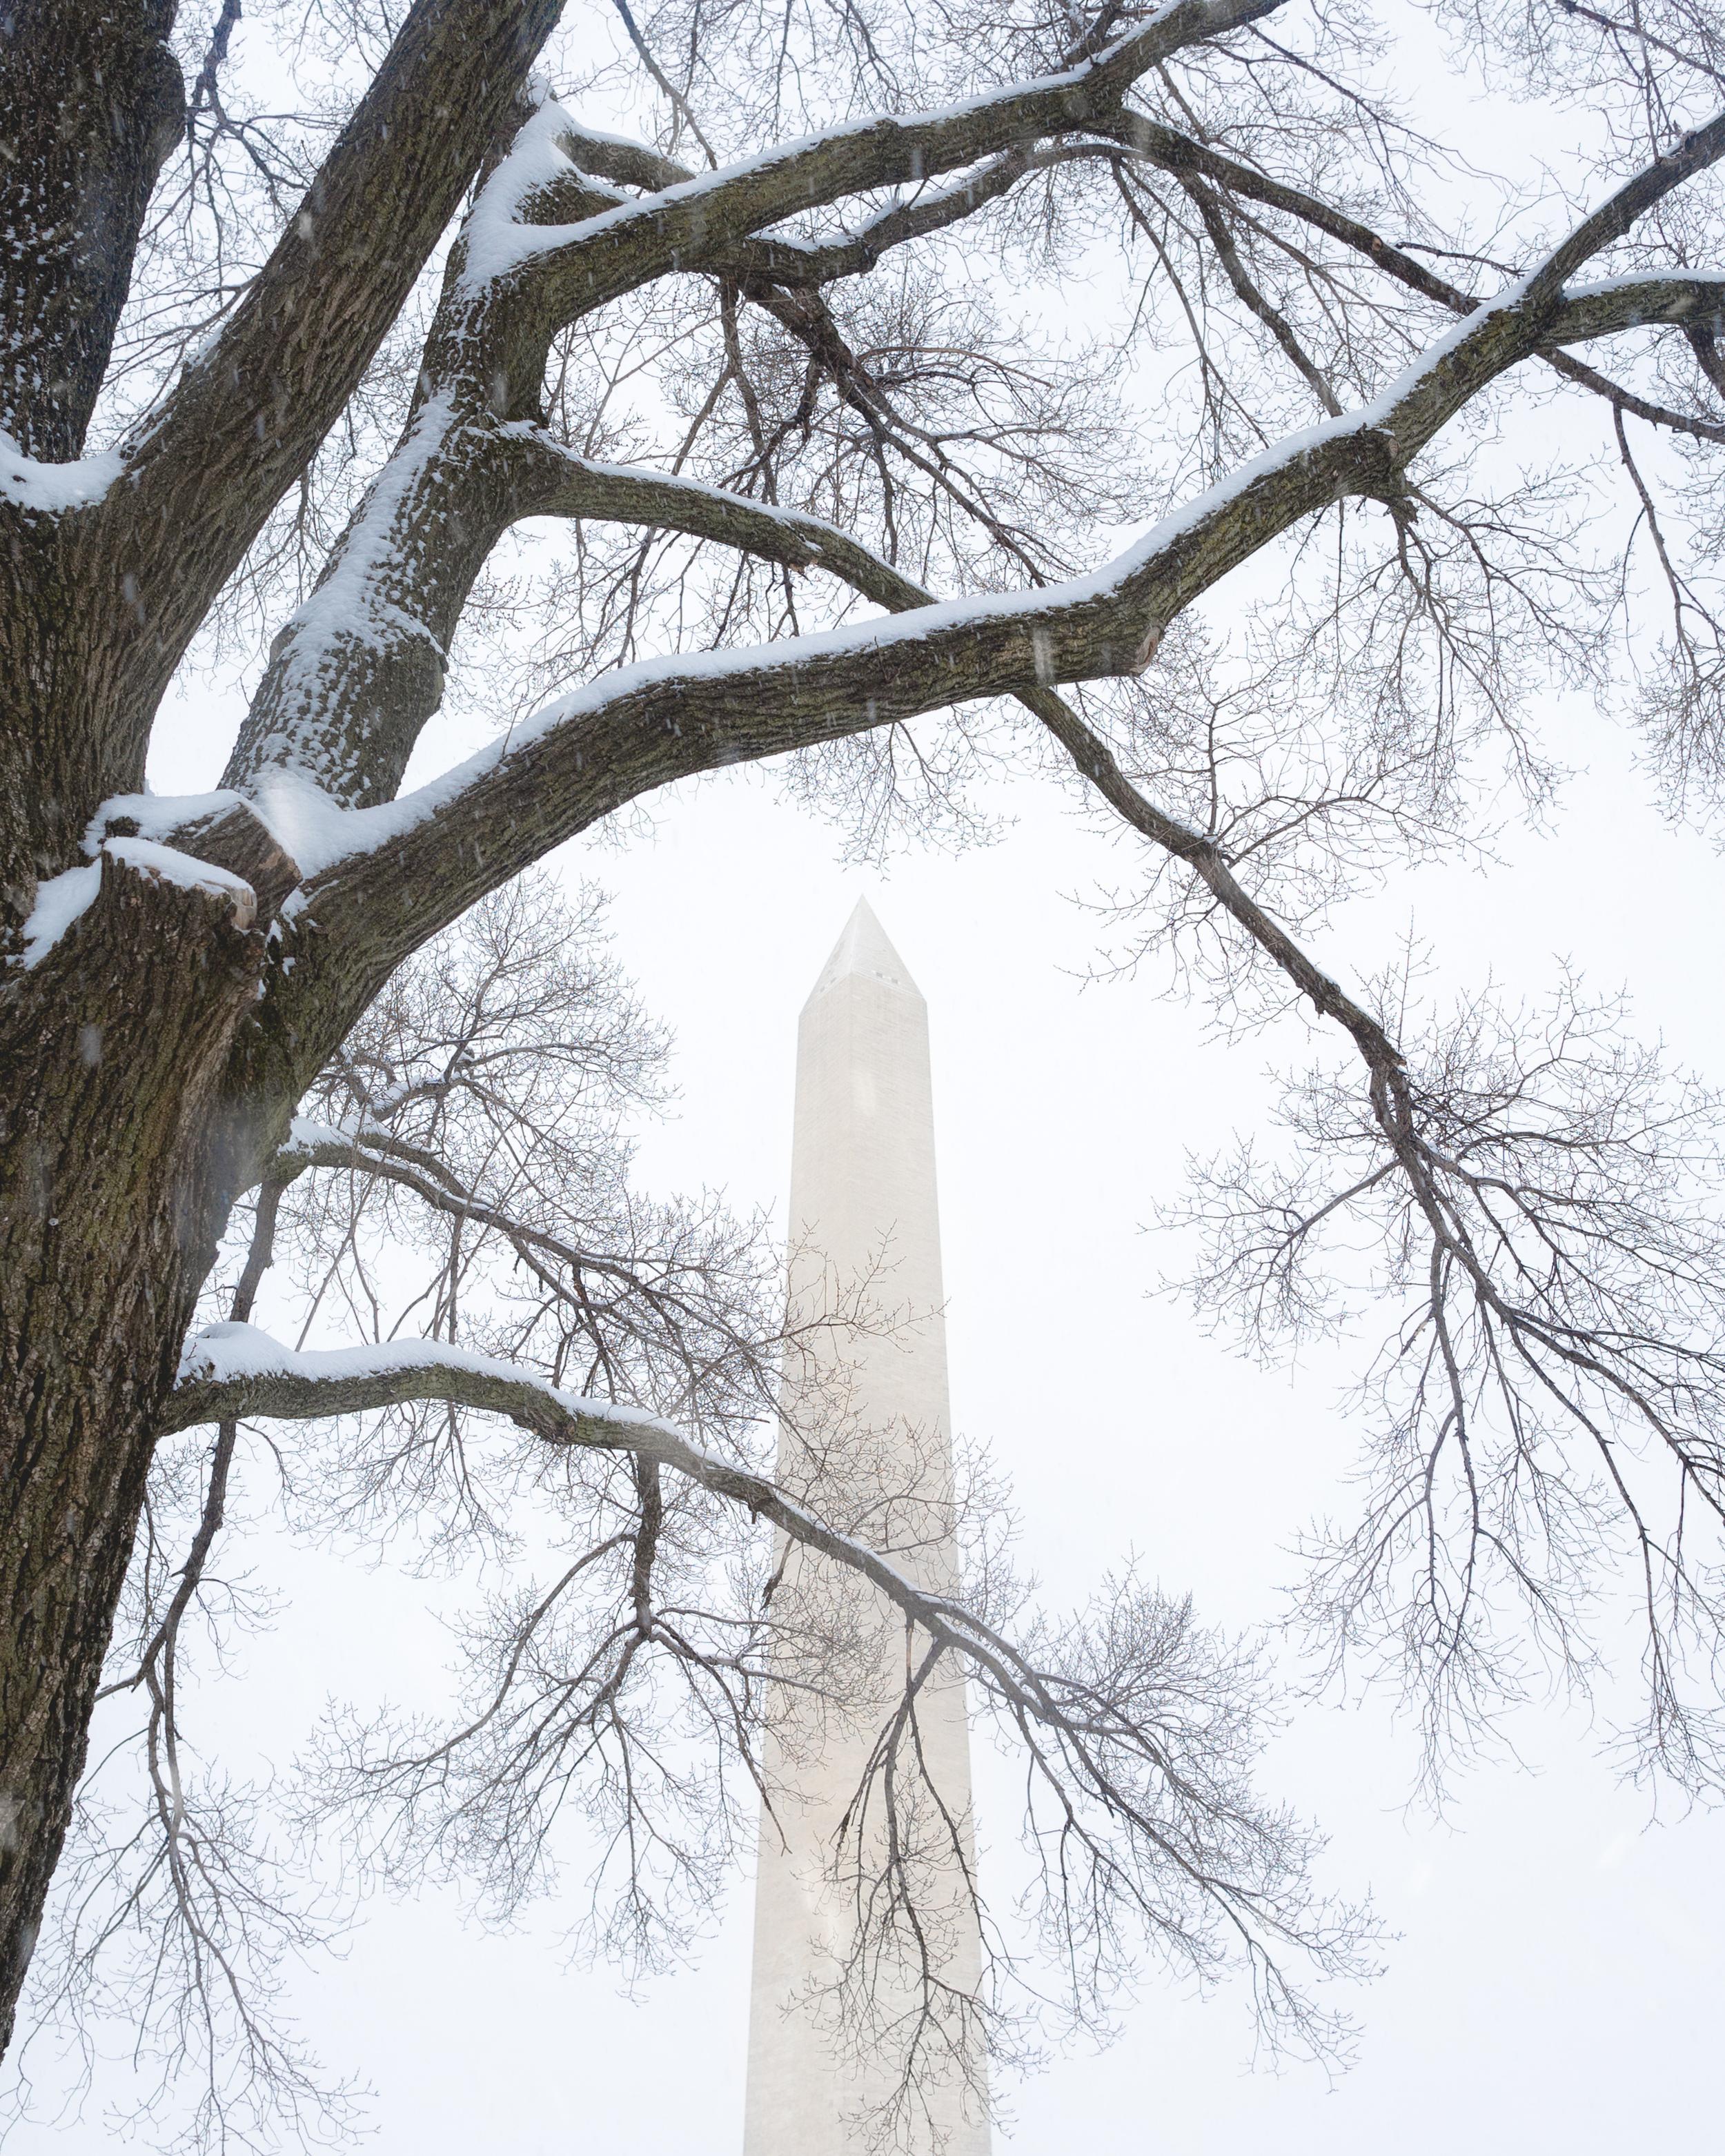 Snowy Washington Monument